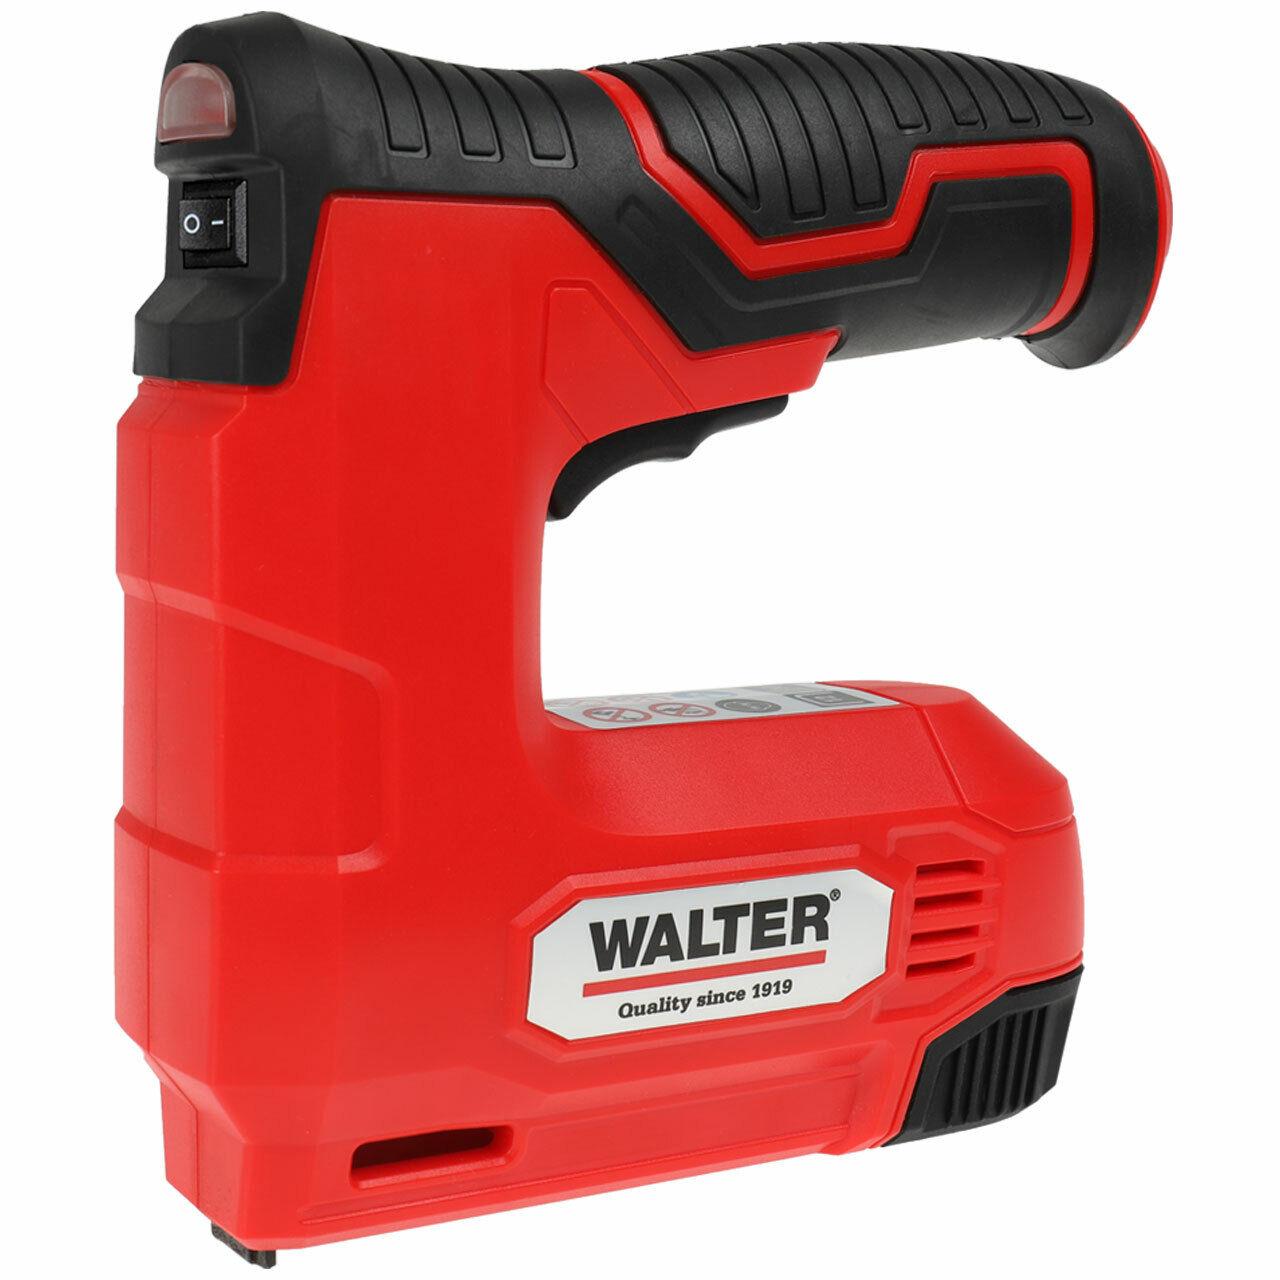 WALTER Akku-Tacker 4V